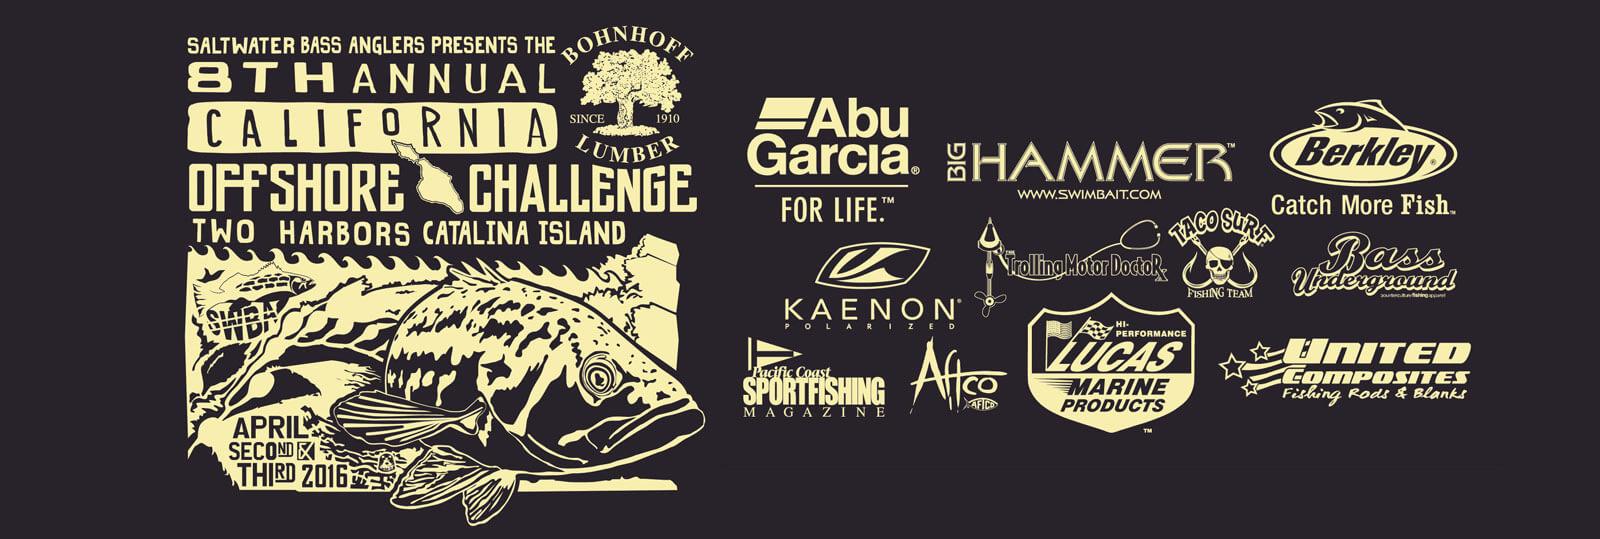 california offshore challenge sponsors